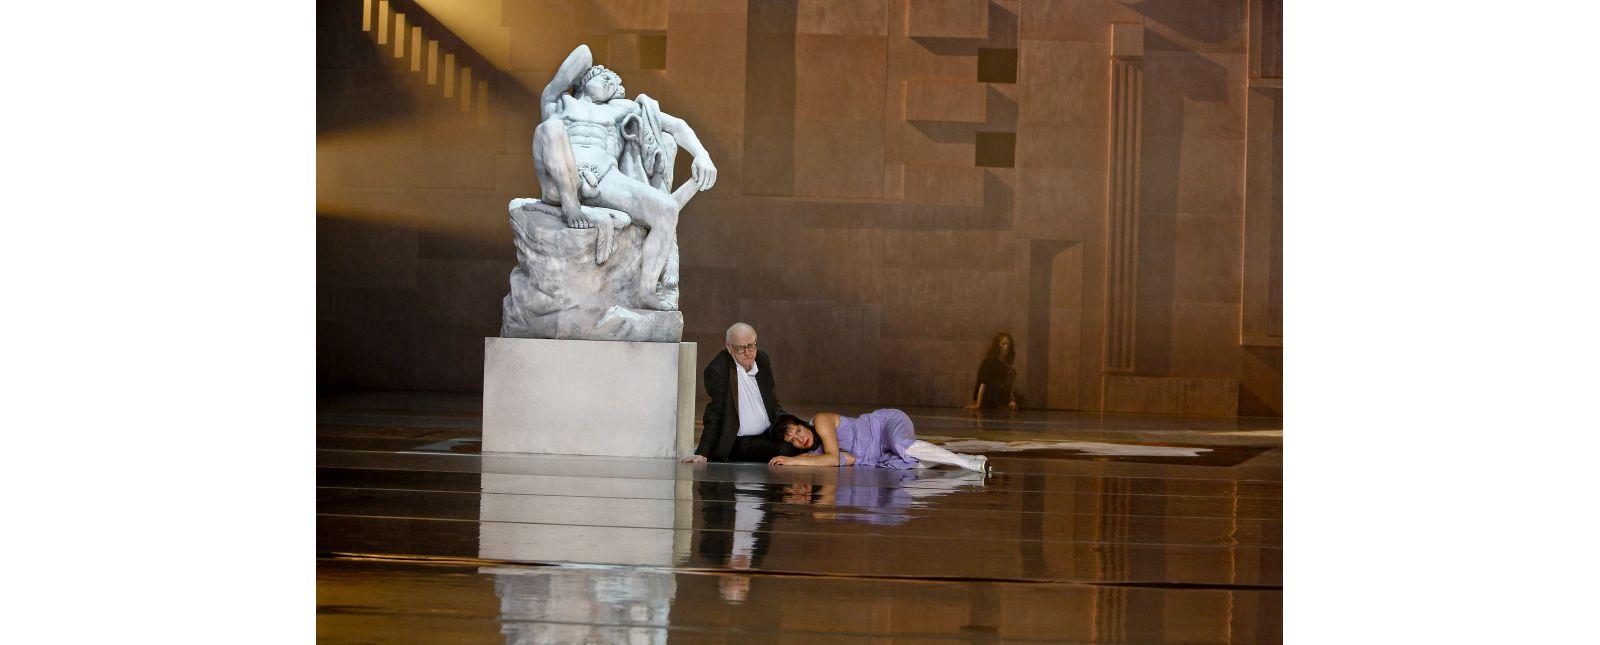 Der Widerspenstigen Zähmung //  Hartmut Stanke / Laura Angelina Palacios / Anja Schweitzer // 2020 // Birgit Hupfeld